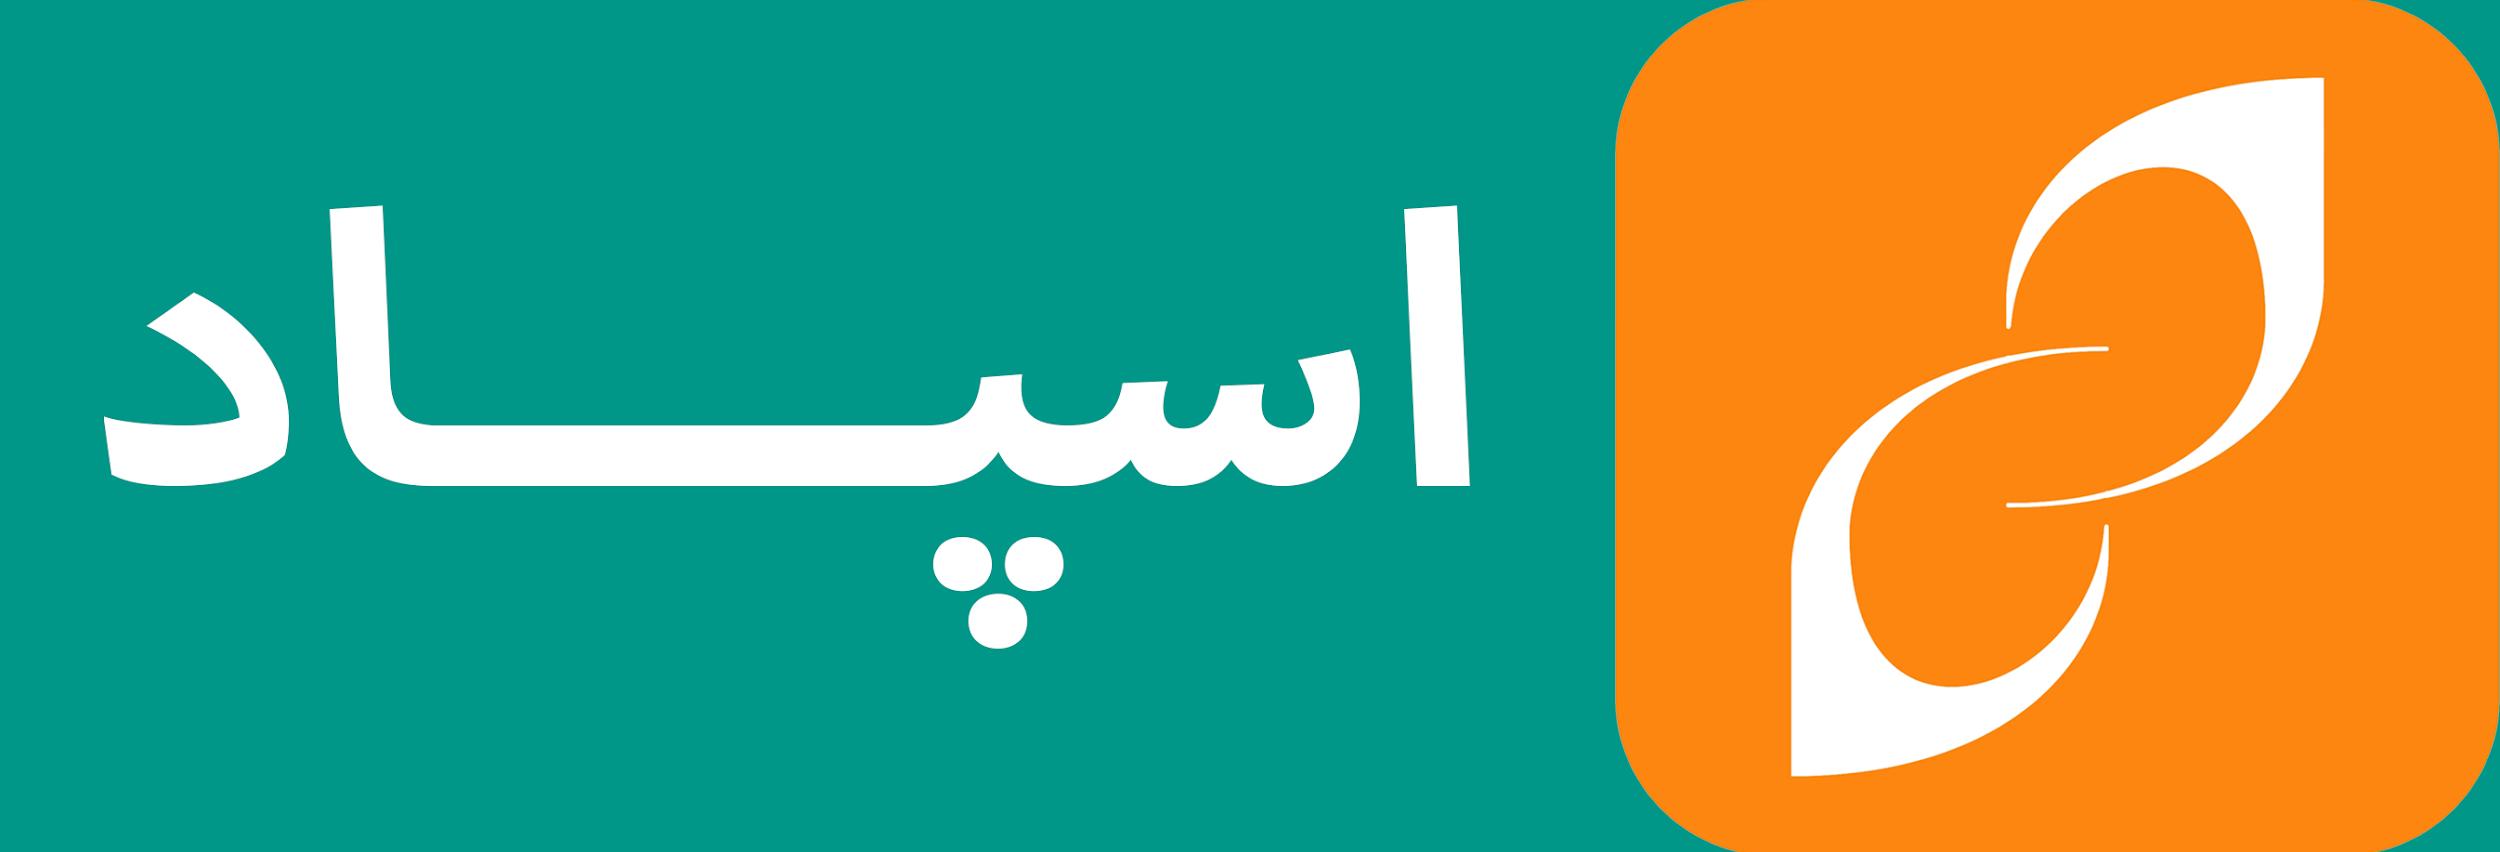 980504001 - معرفی اپلیکیشن خدمات آنلاین اسپاد